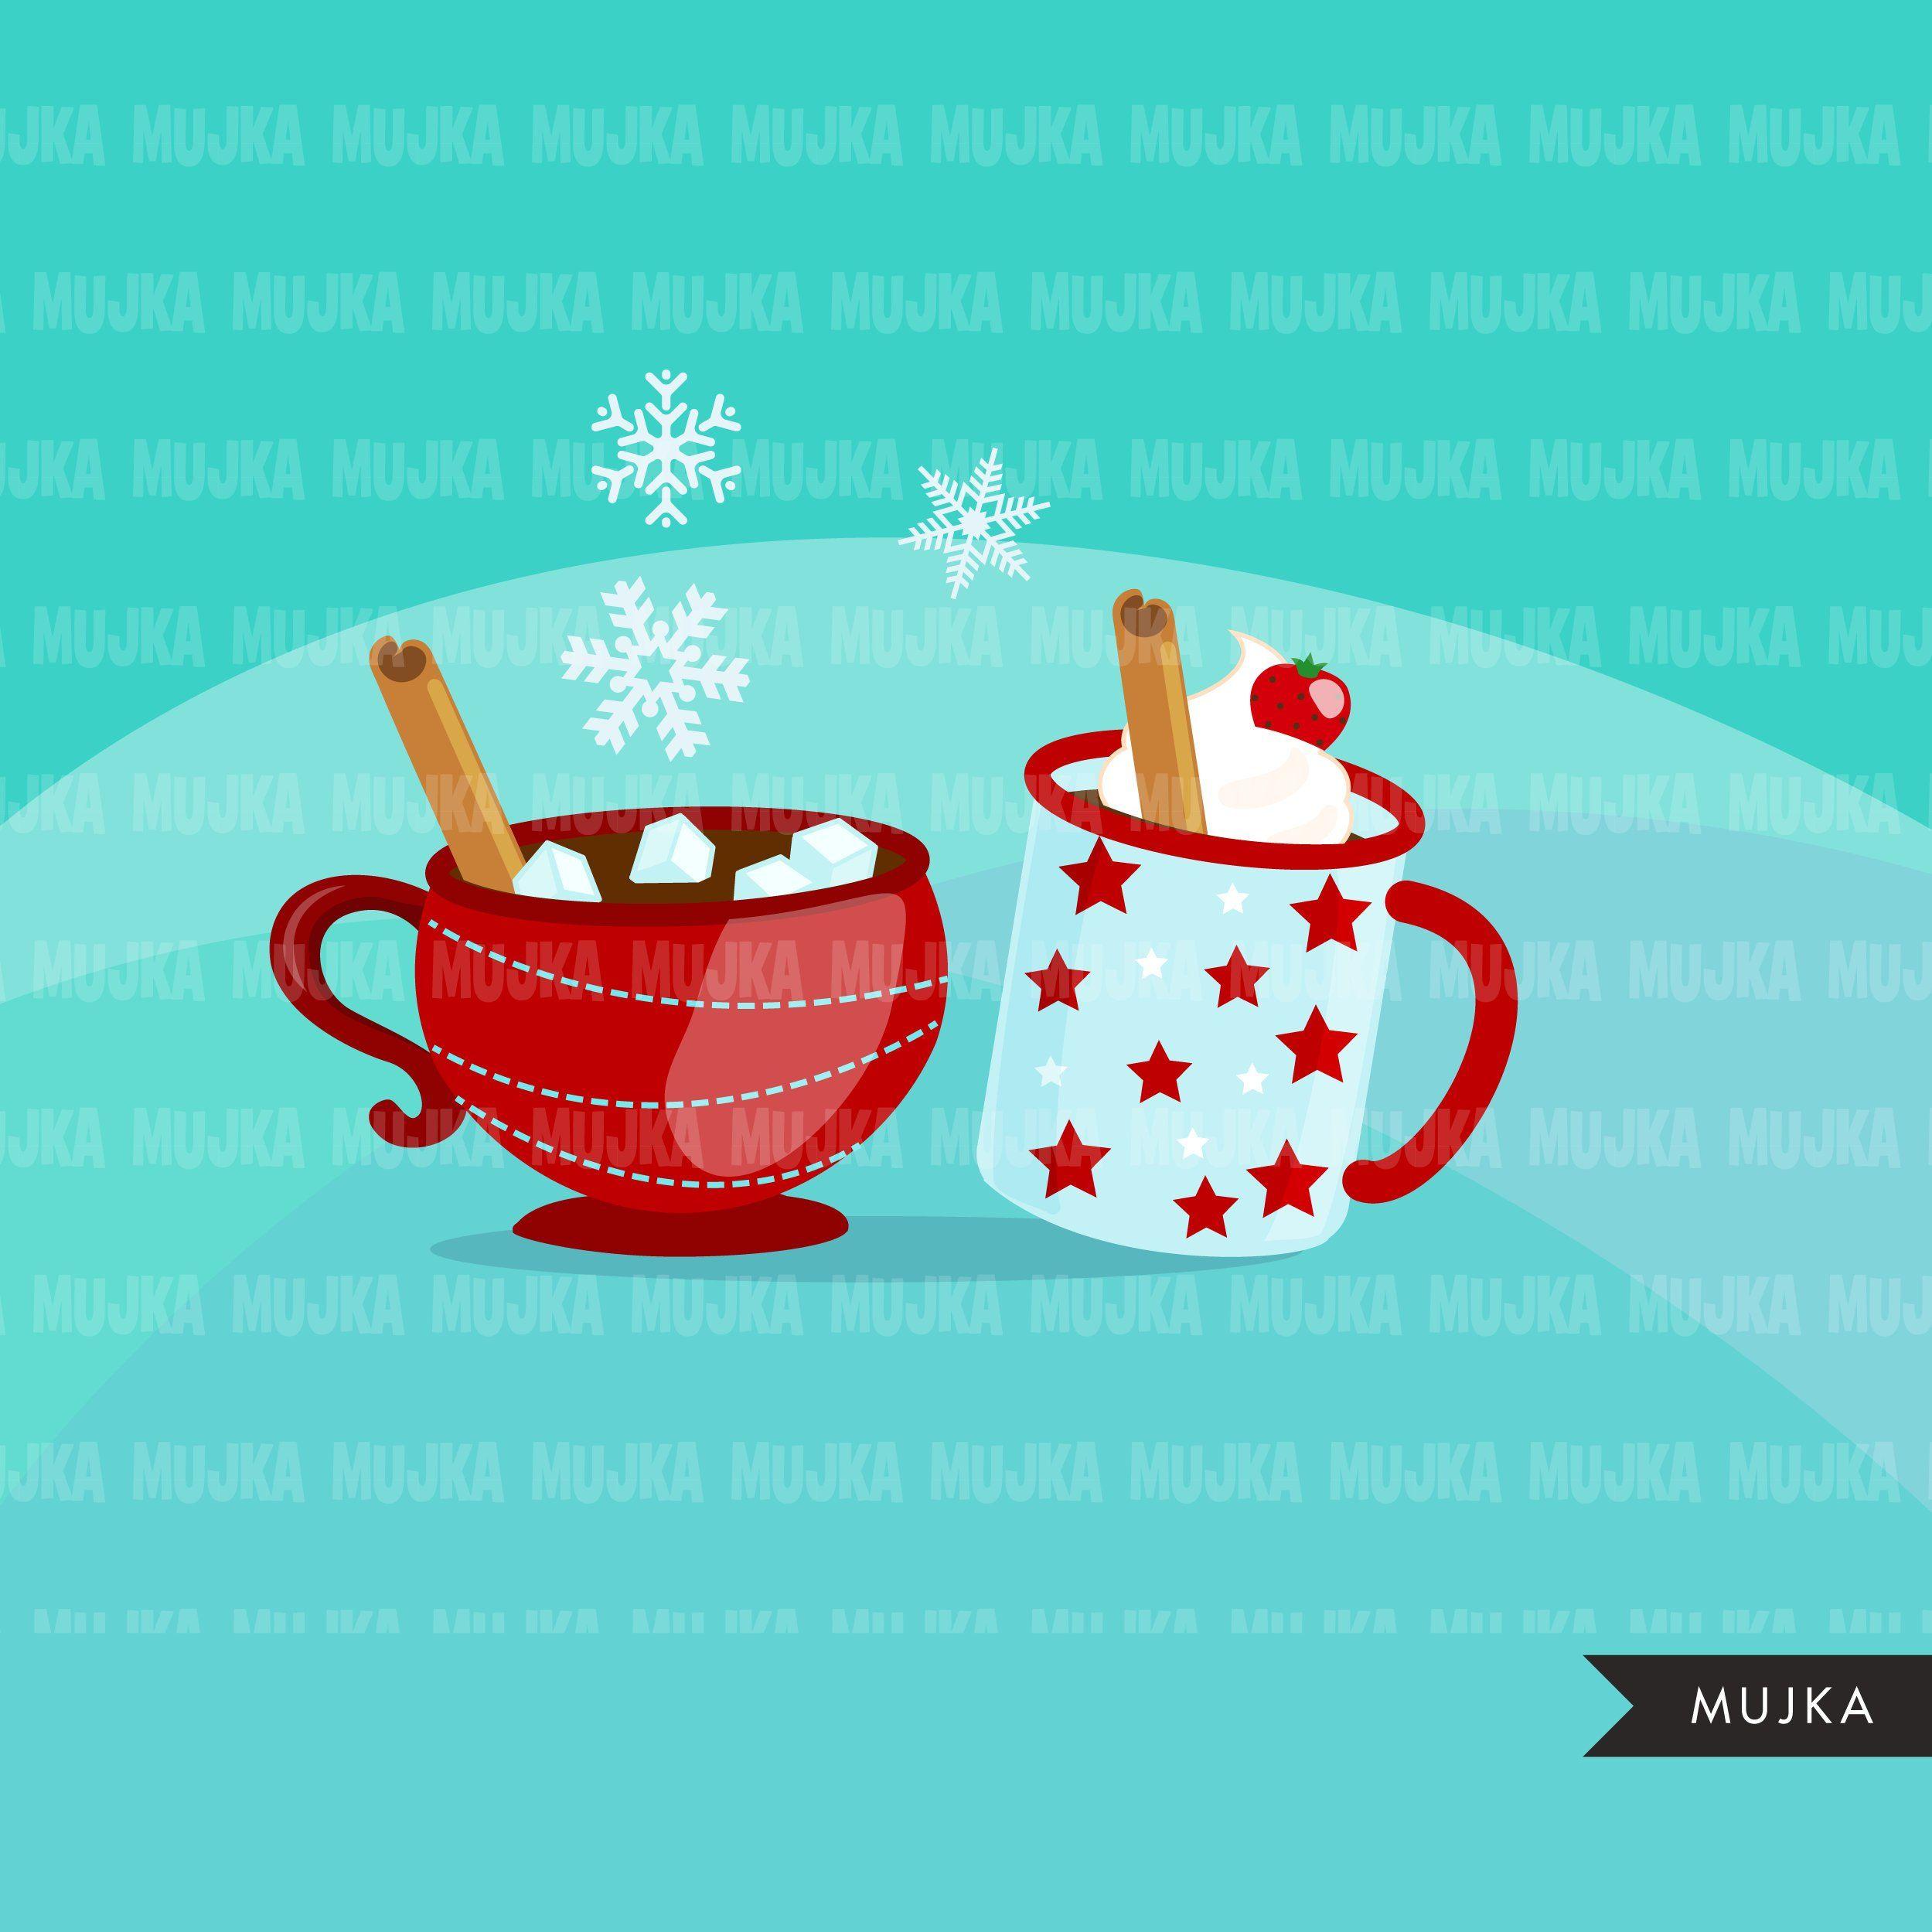 Hot Chocolate Clipart Marshmallow Cinnamon Kind Of Day Snowflakes Plaid Christmas Clip Art Graphics Hot Chocolate Clipart Hot Chocolate Scrapbooking Set